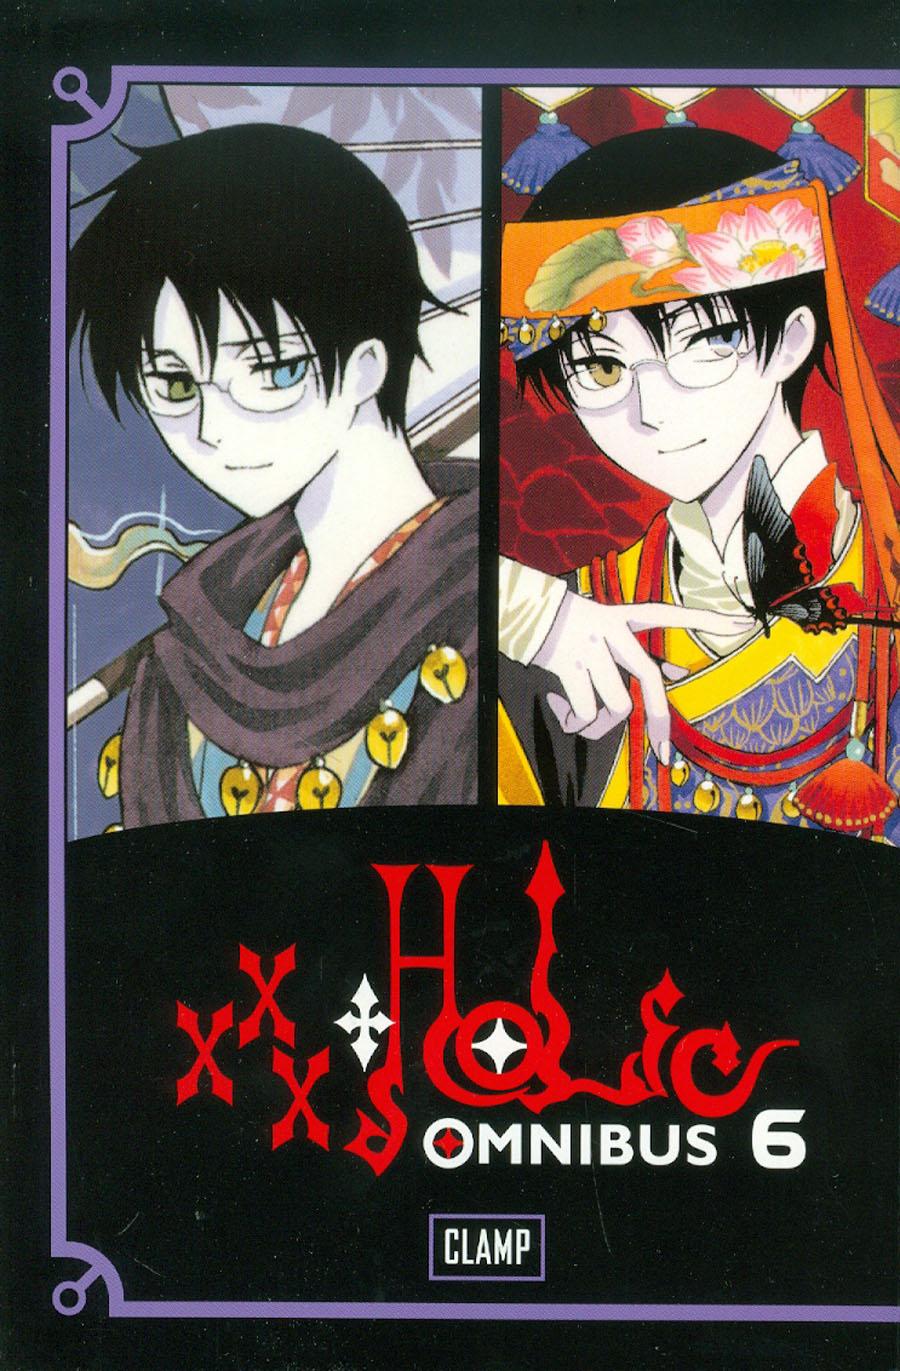 xxxHolic Omnibus Vol 6 GN